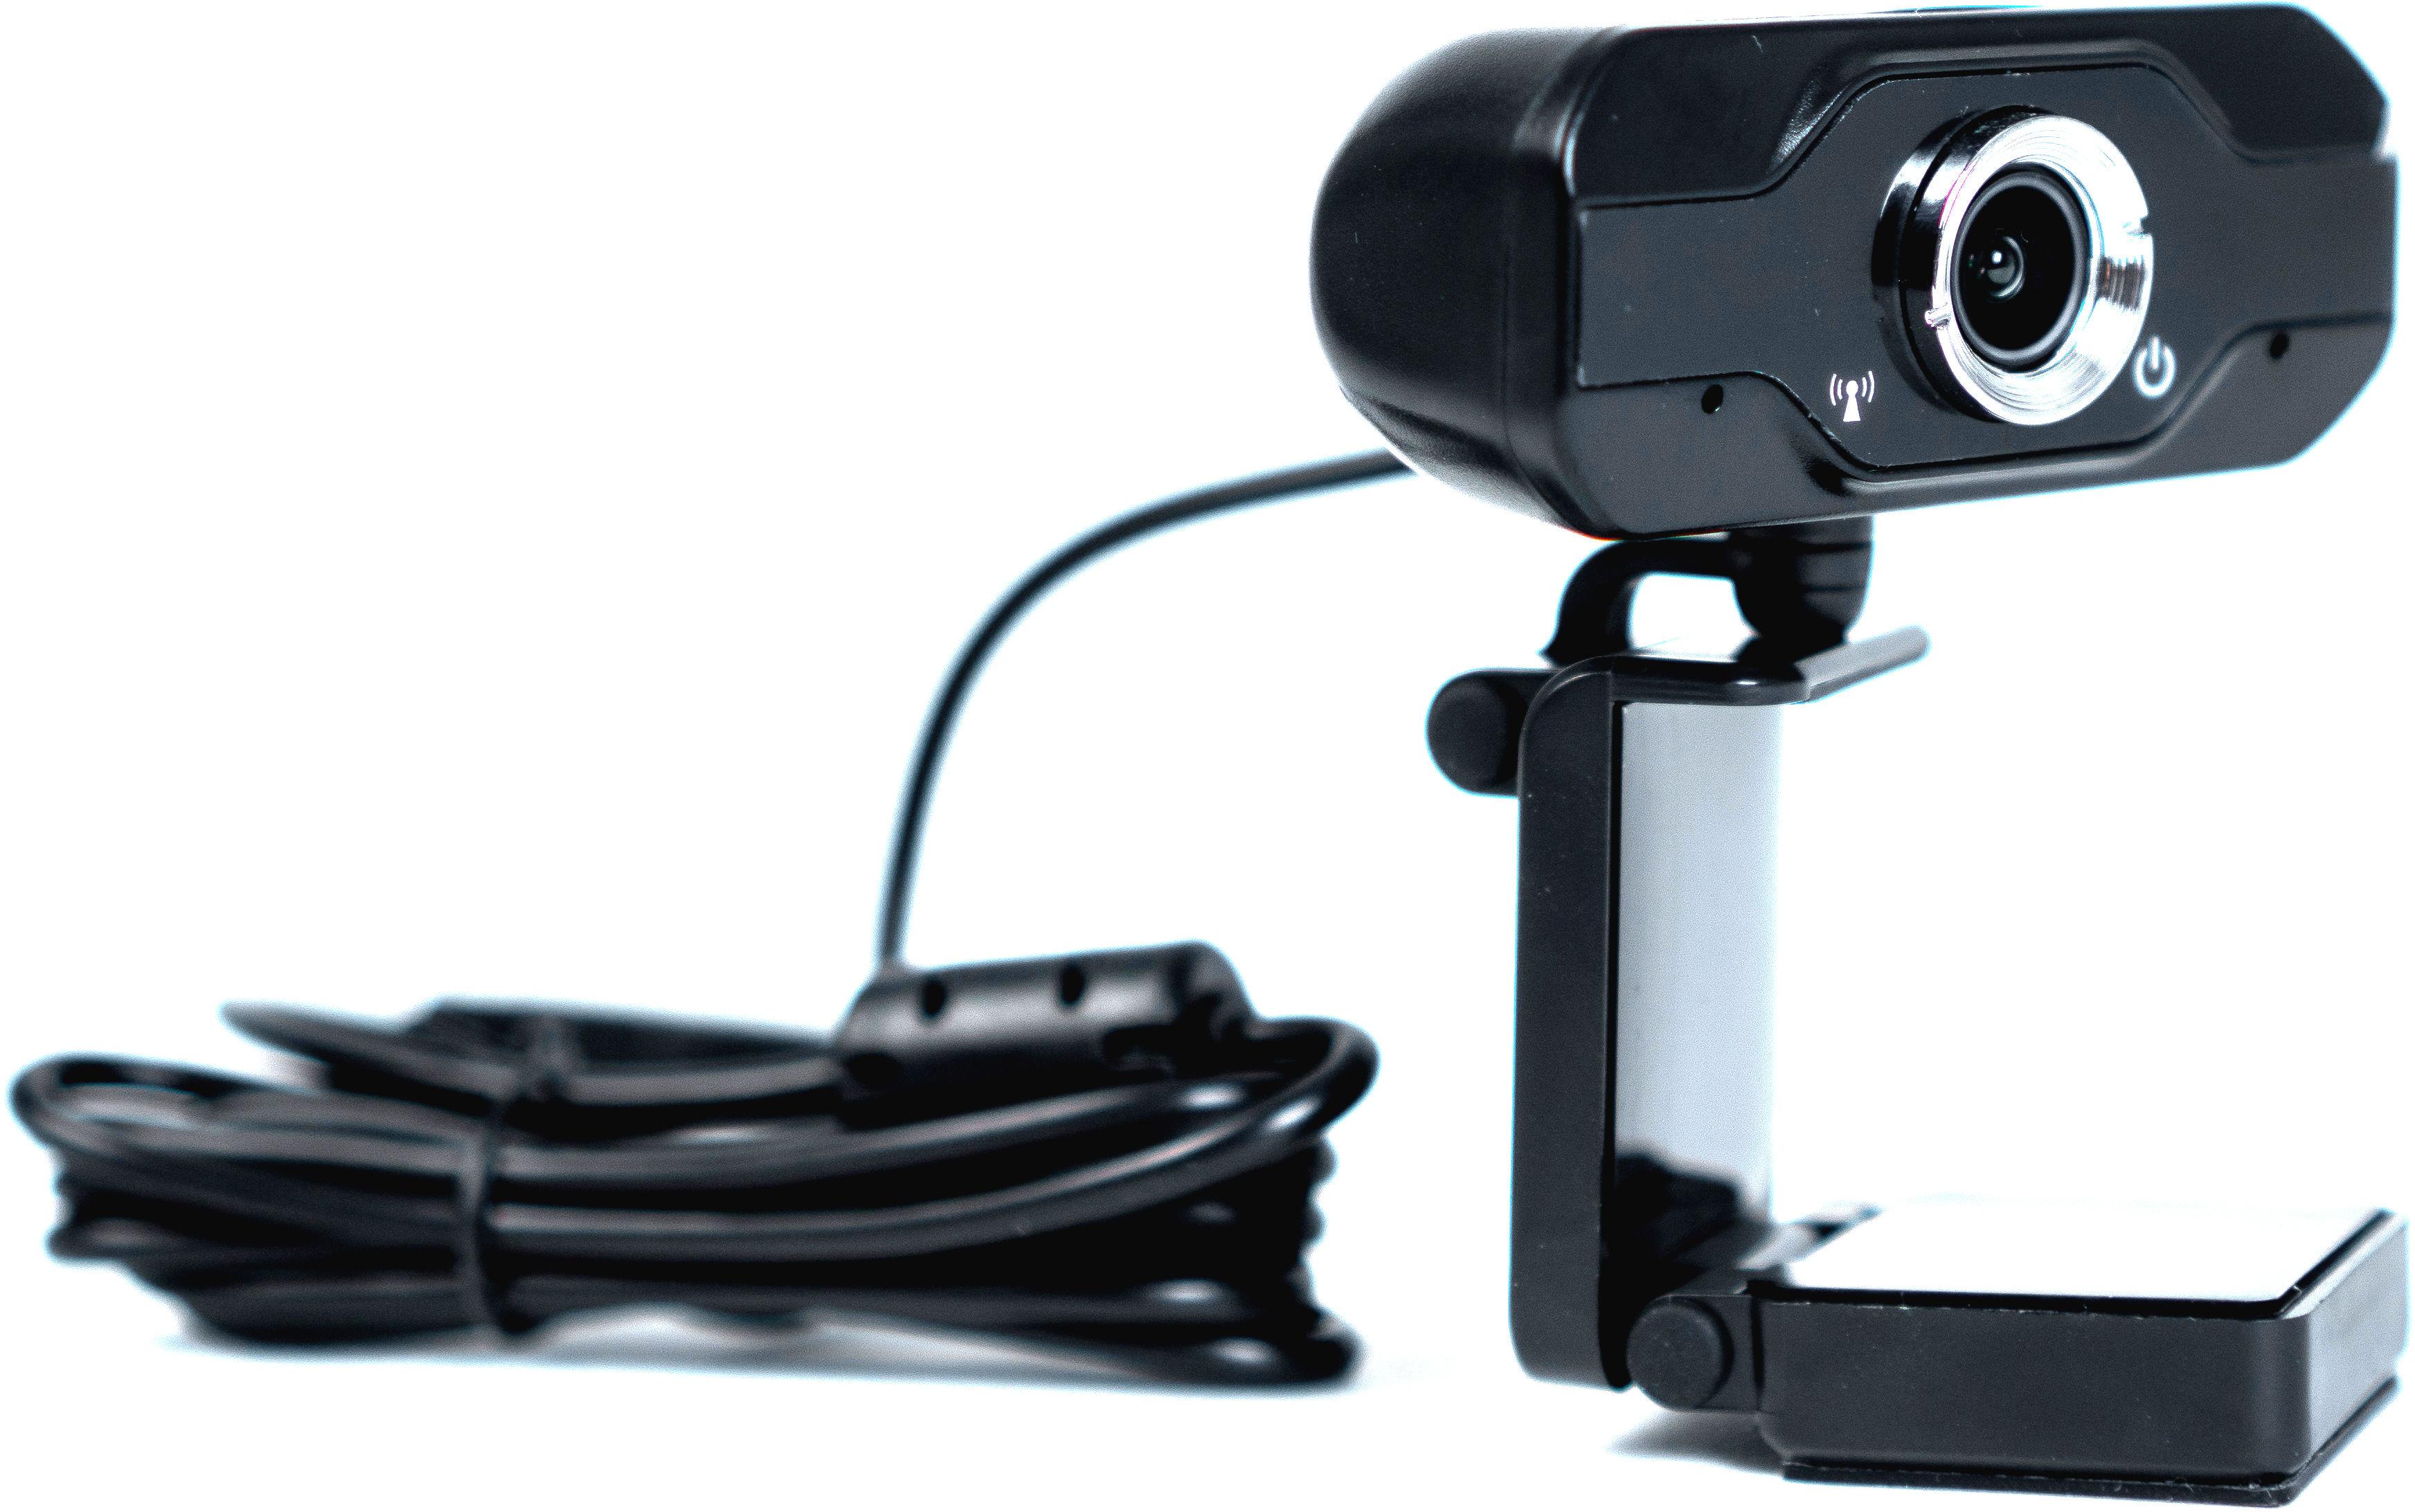 Kamera internetowa Gallop 1080p PRO 30 fps 2 x mikrofon